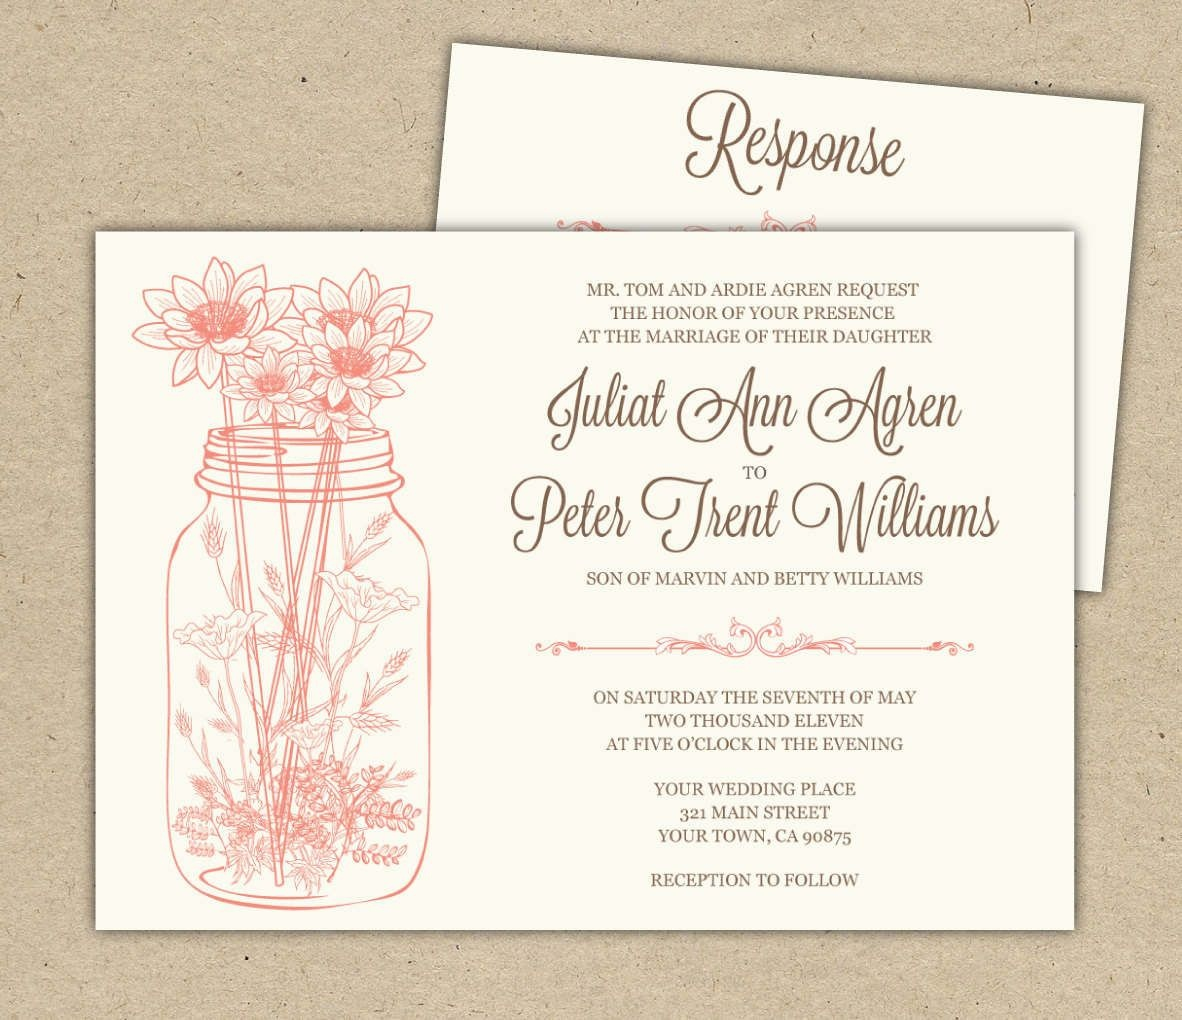 Free Printable Bridal Shower Invitations | Wedding Invitations - Free Mason Jar Wedding Invitation Printable Templates